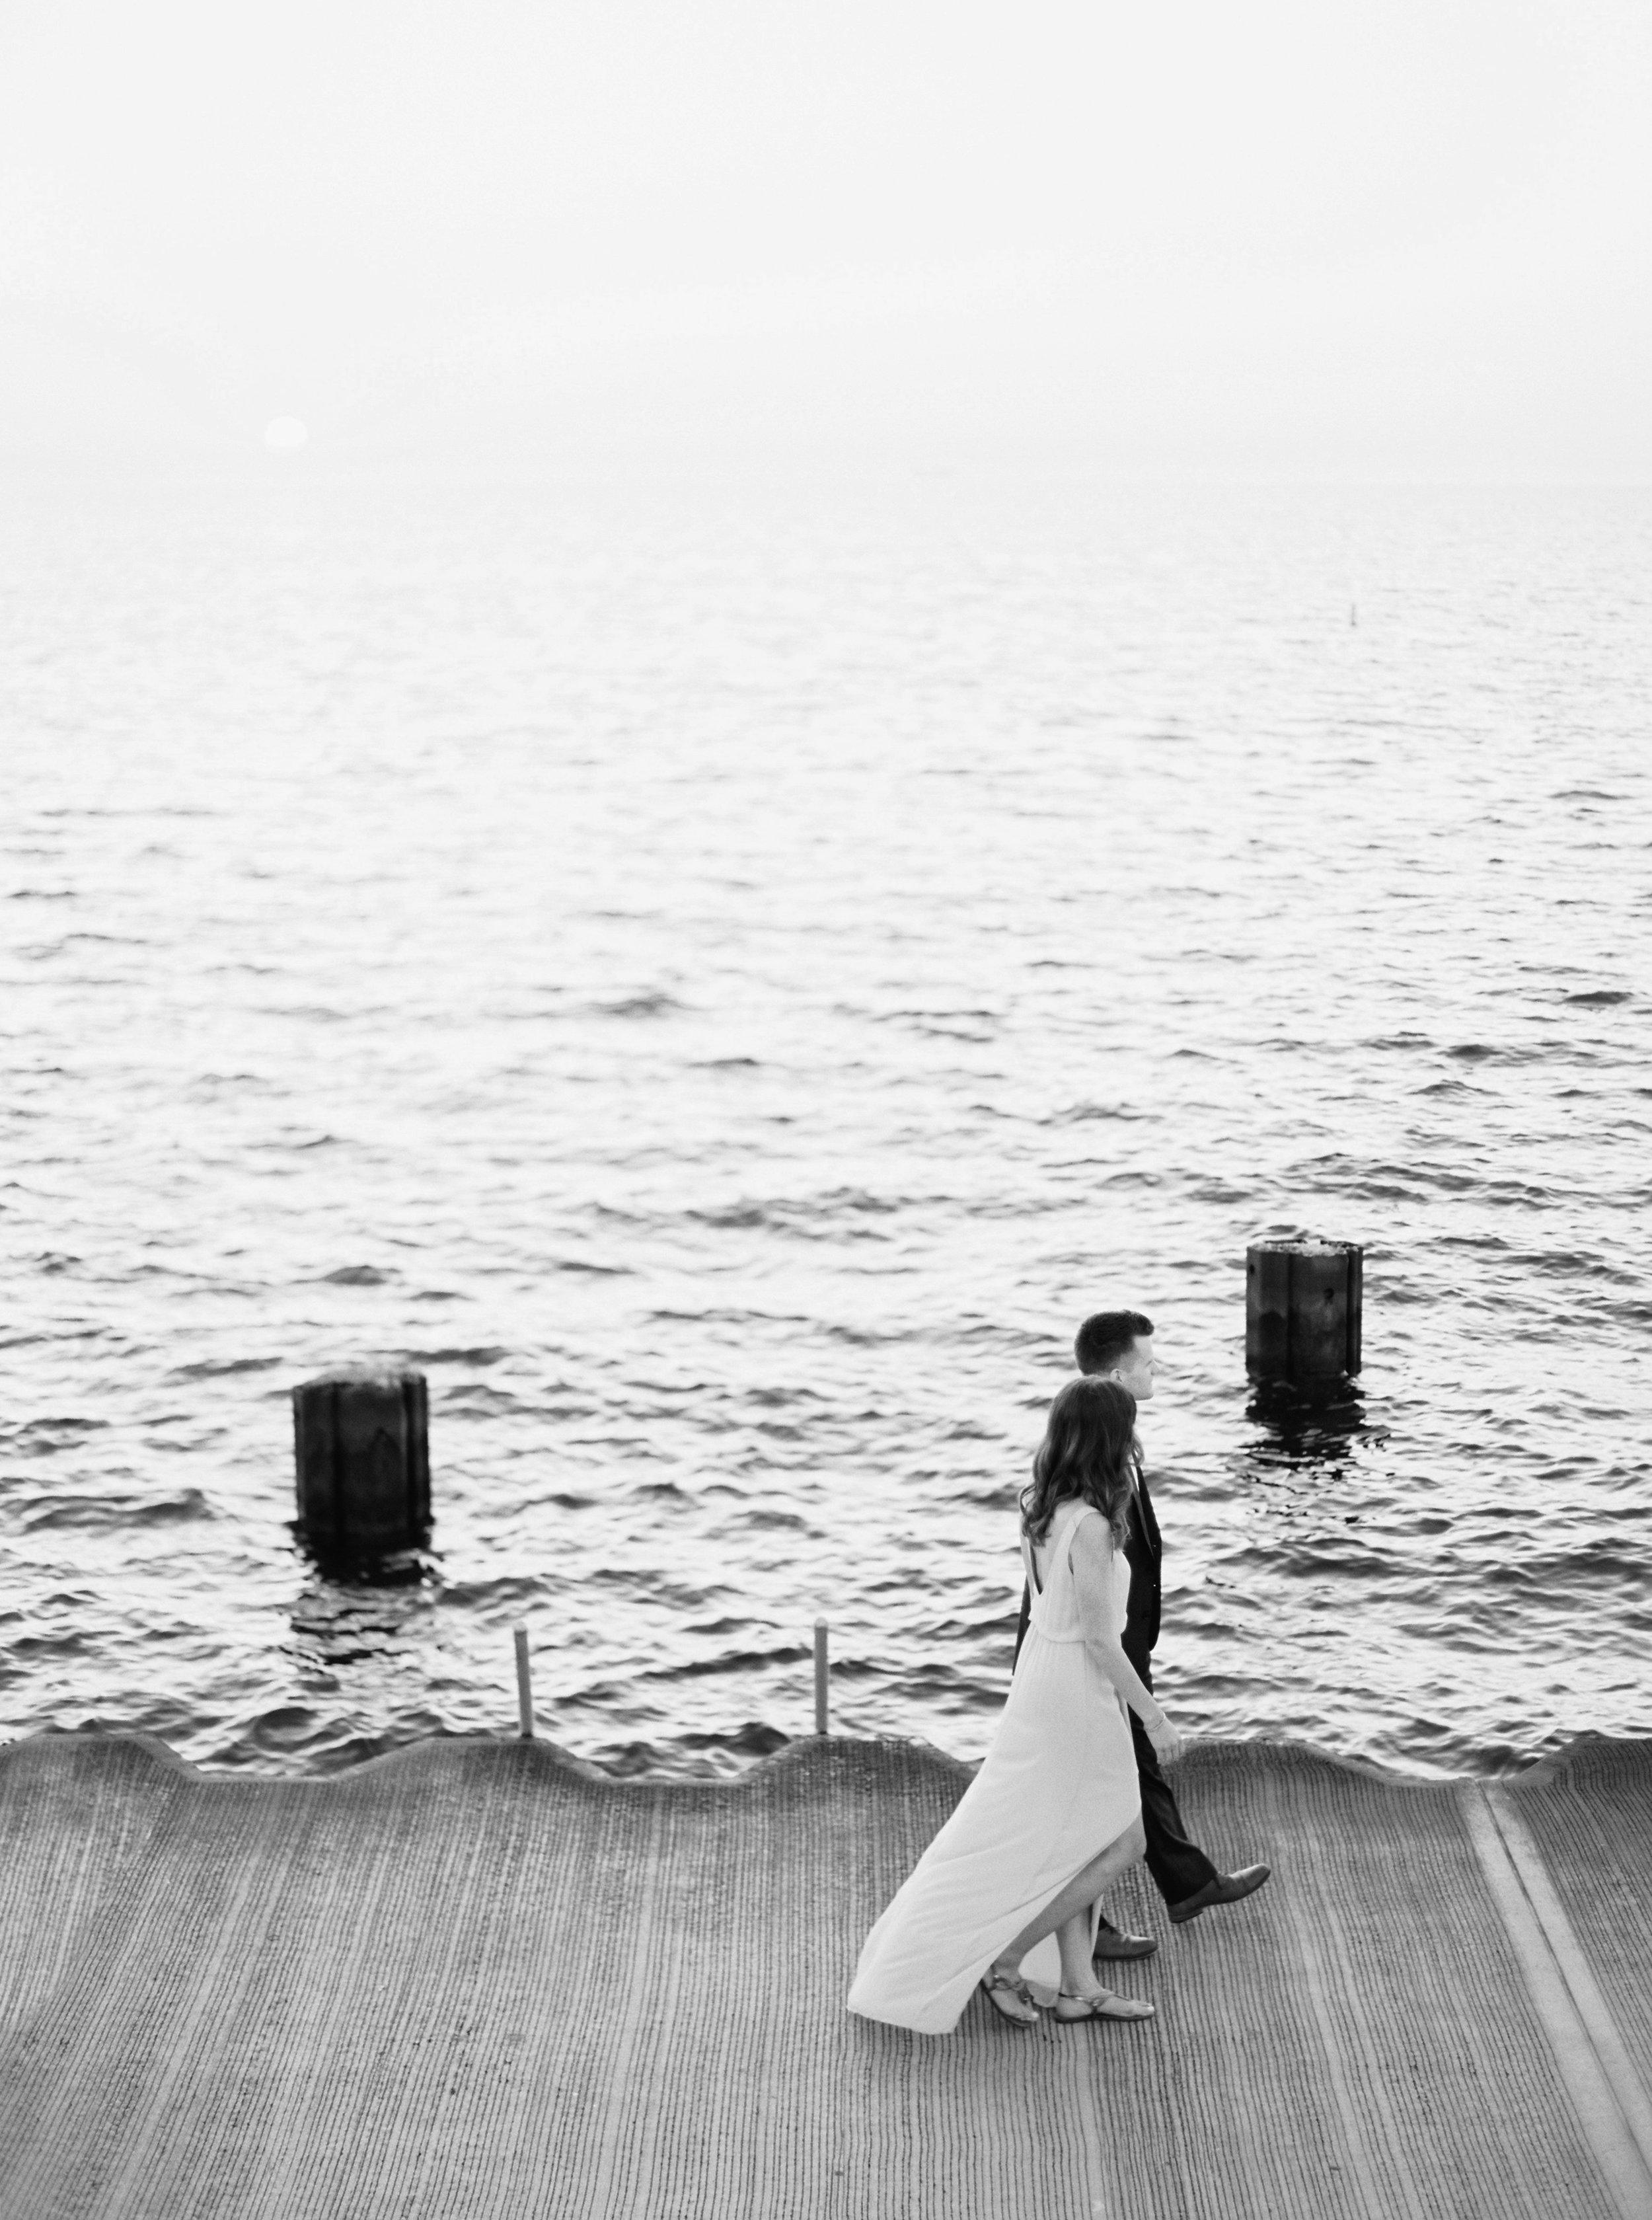 Kyle John l Fine Art Wedding Photography l Chicago, Copenhagen, California, New York, Destination l Blog l Nathalie and Colby_Lake Michigan_Sunrise Engagement_2